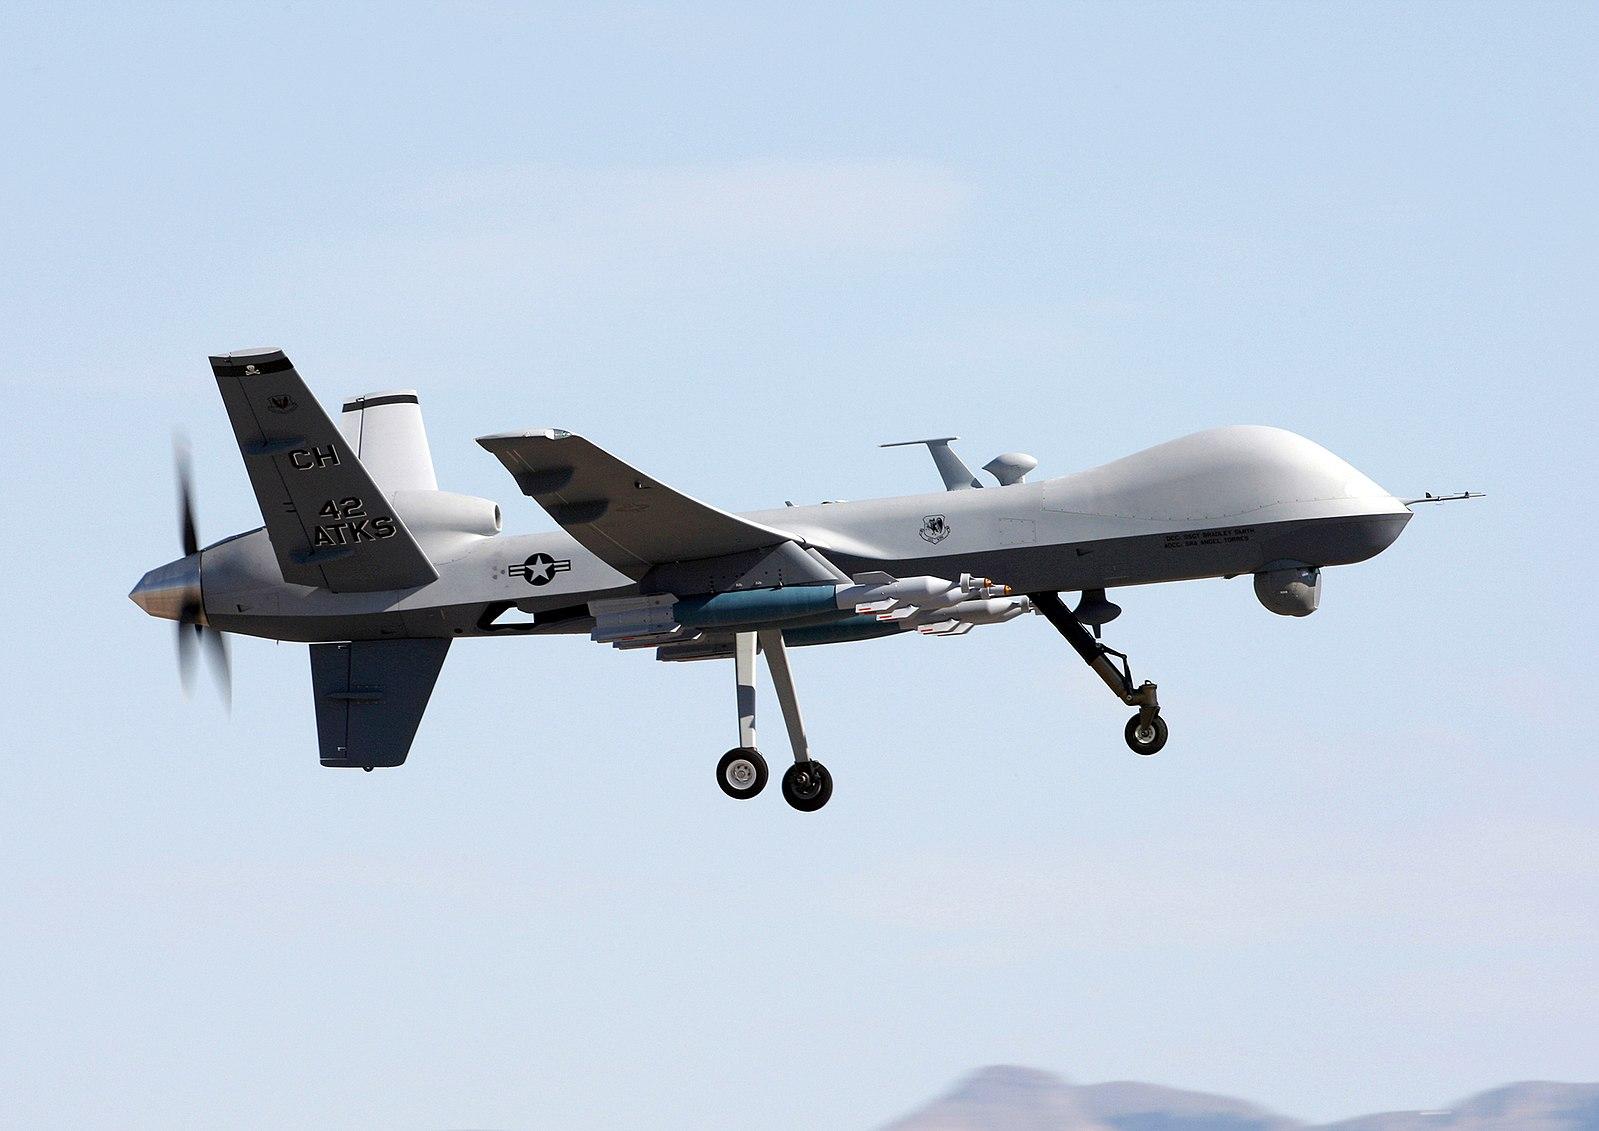 The MQ-9 Reaper drone. (Photo: U.S. Air Force/Paul Ridgeway)